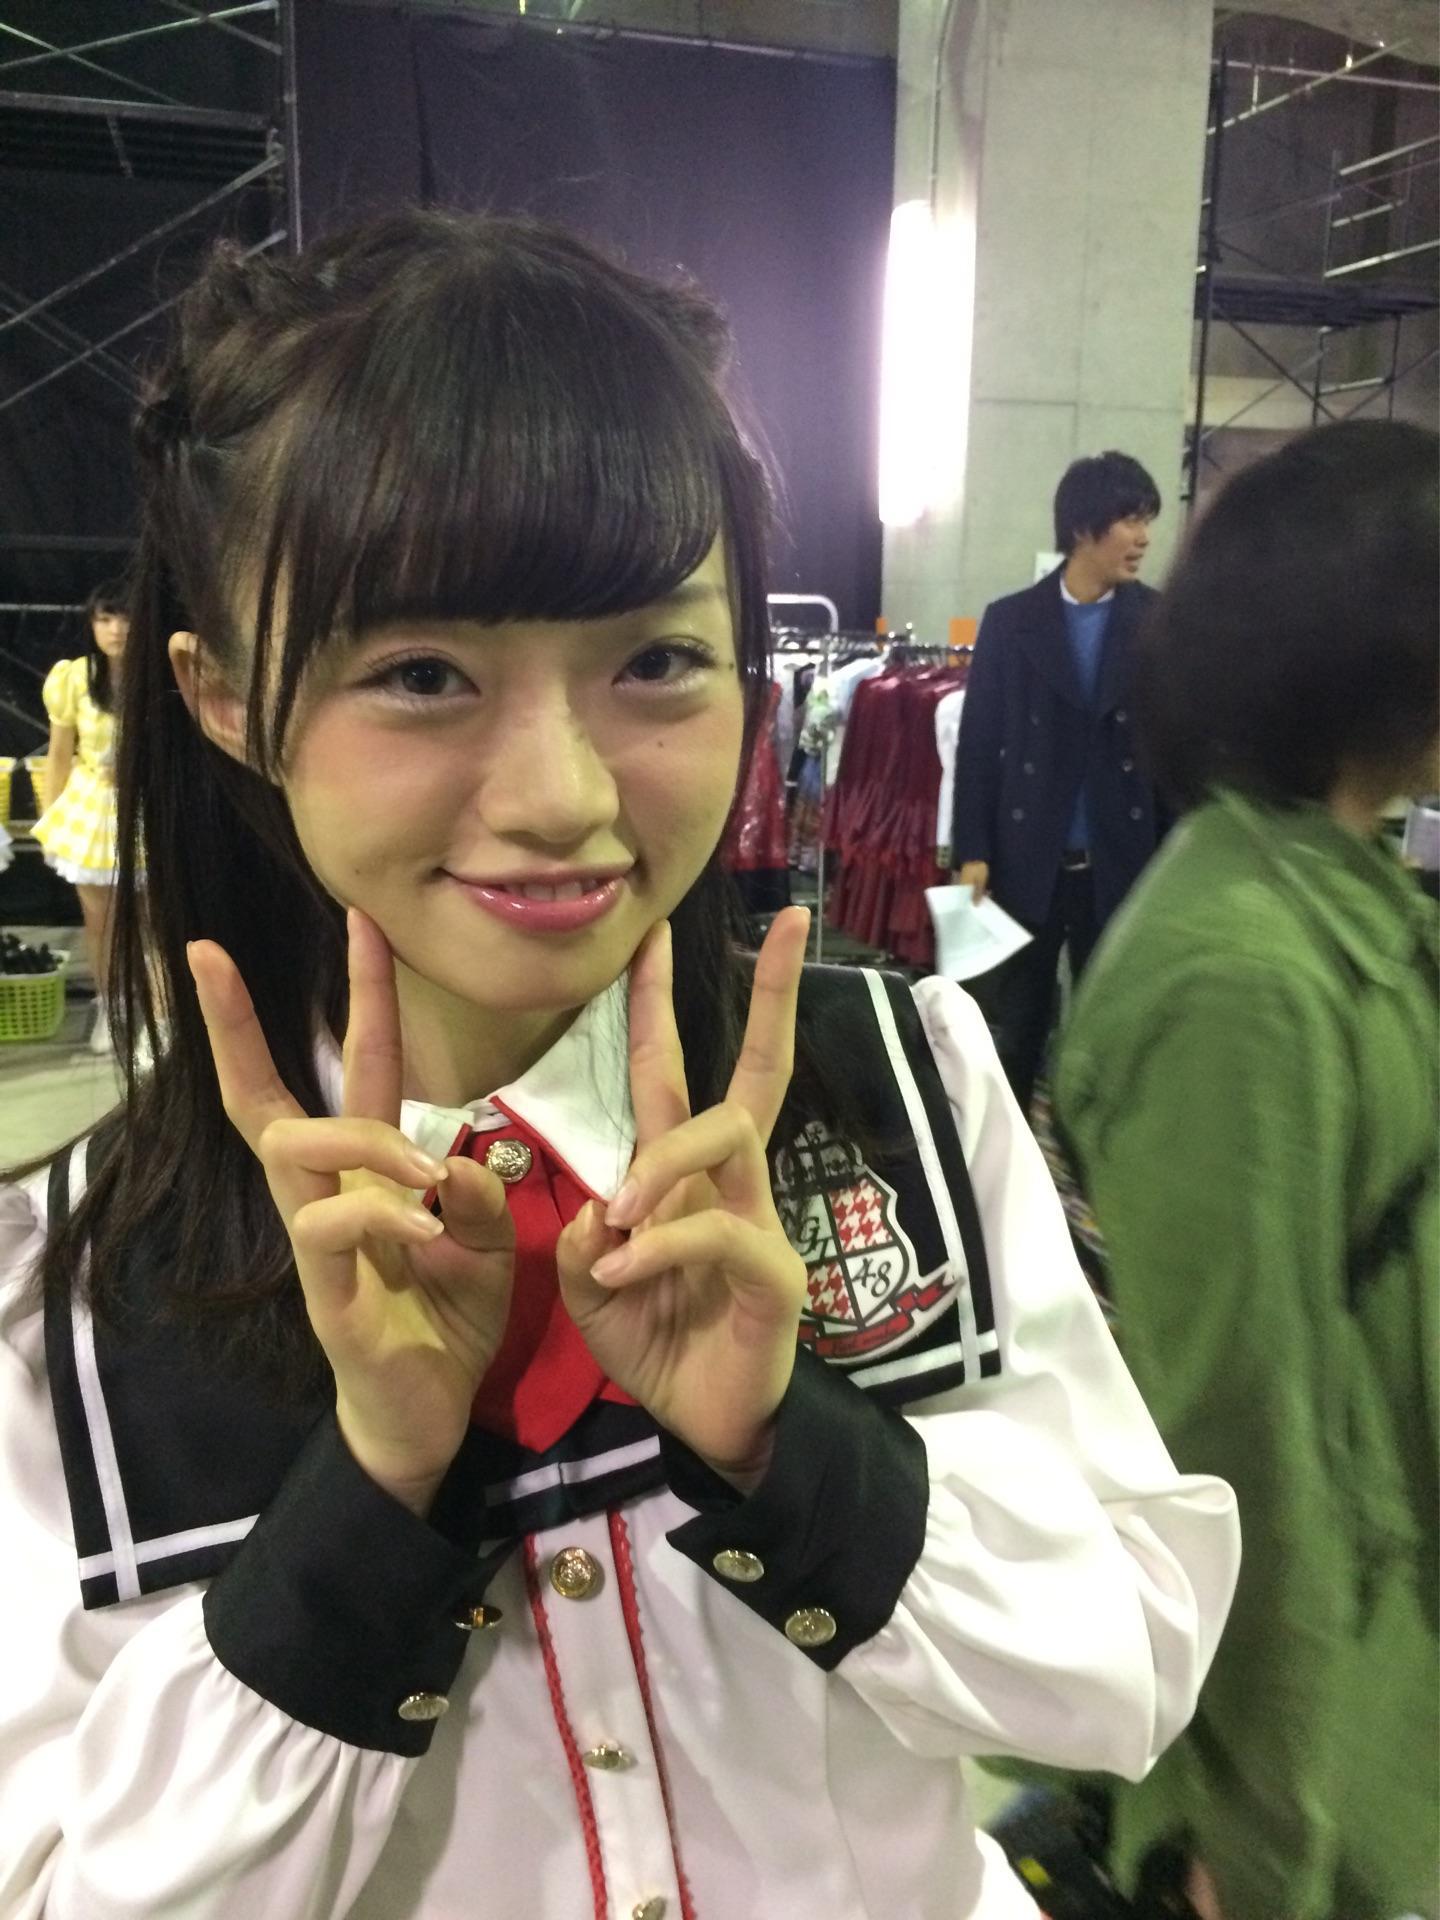 【NGT48】4・12CDデビュー決定! センターは中井りか、サプライズ発表に「ギャー! いやいや」 [無断転載禁止]©2ch.netYouTube動画>2本 ->画像>85枚